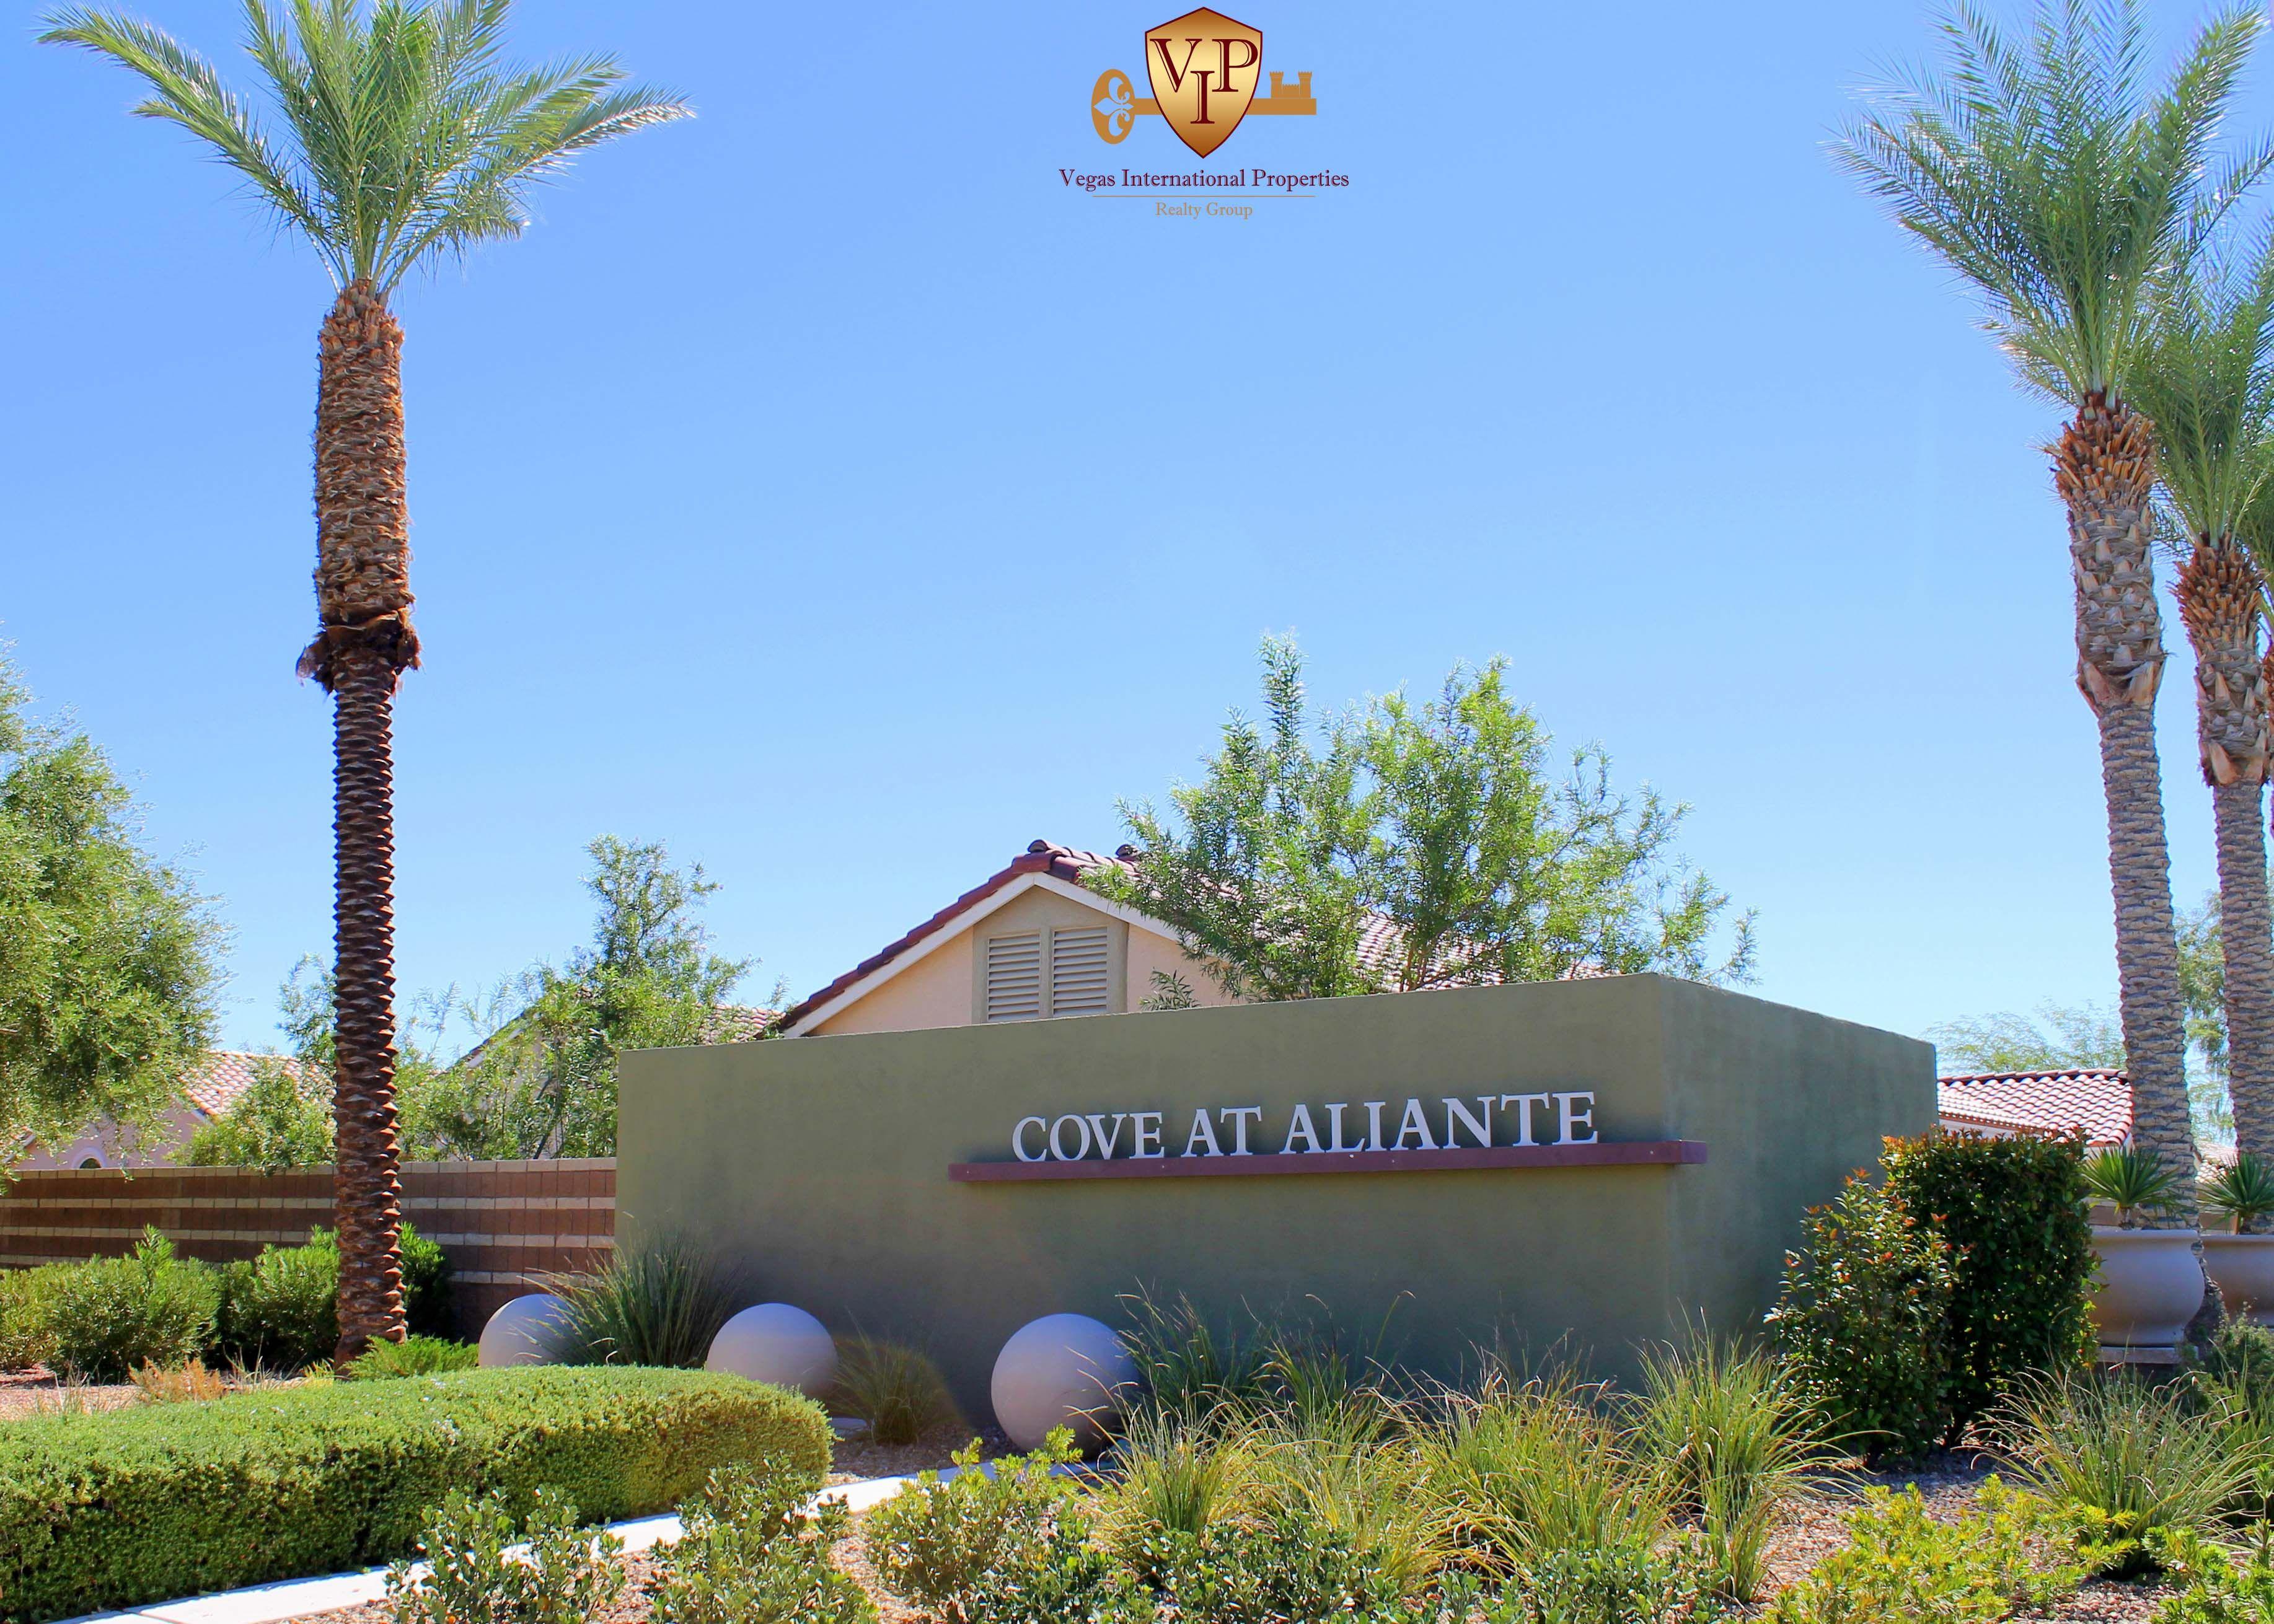 Cove at Aliante Single Story Homes North Las Vegas NV 89084